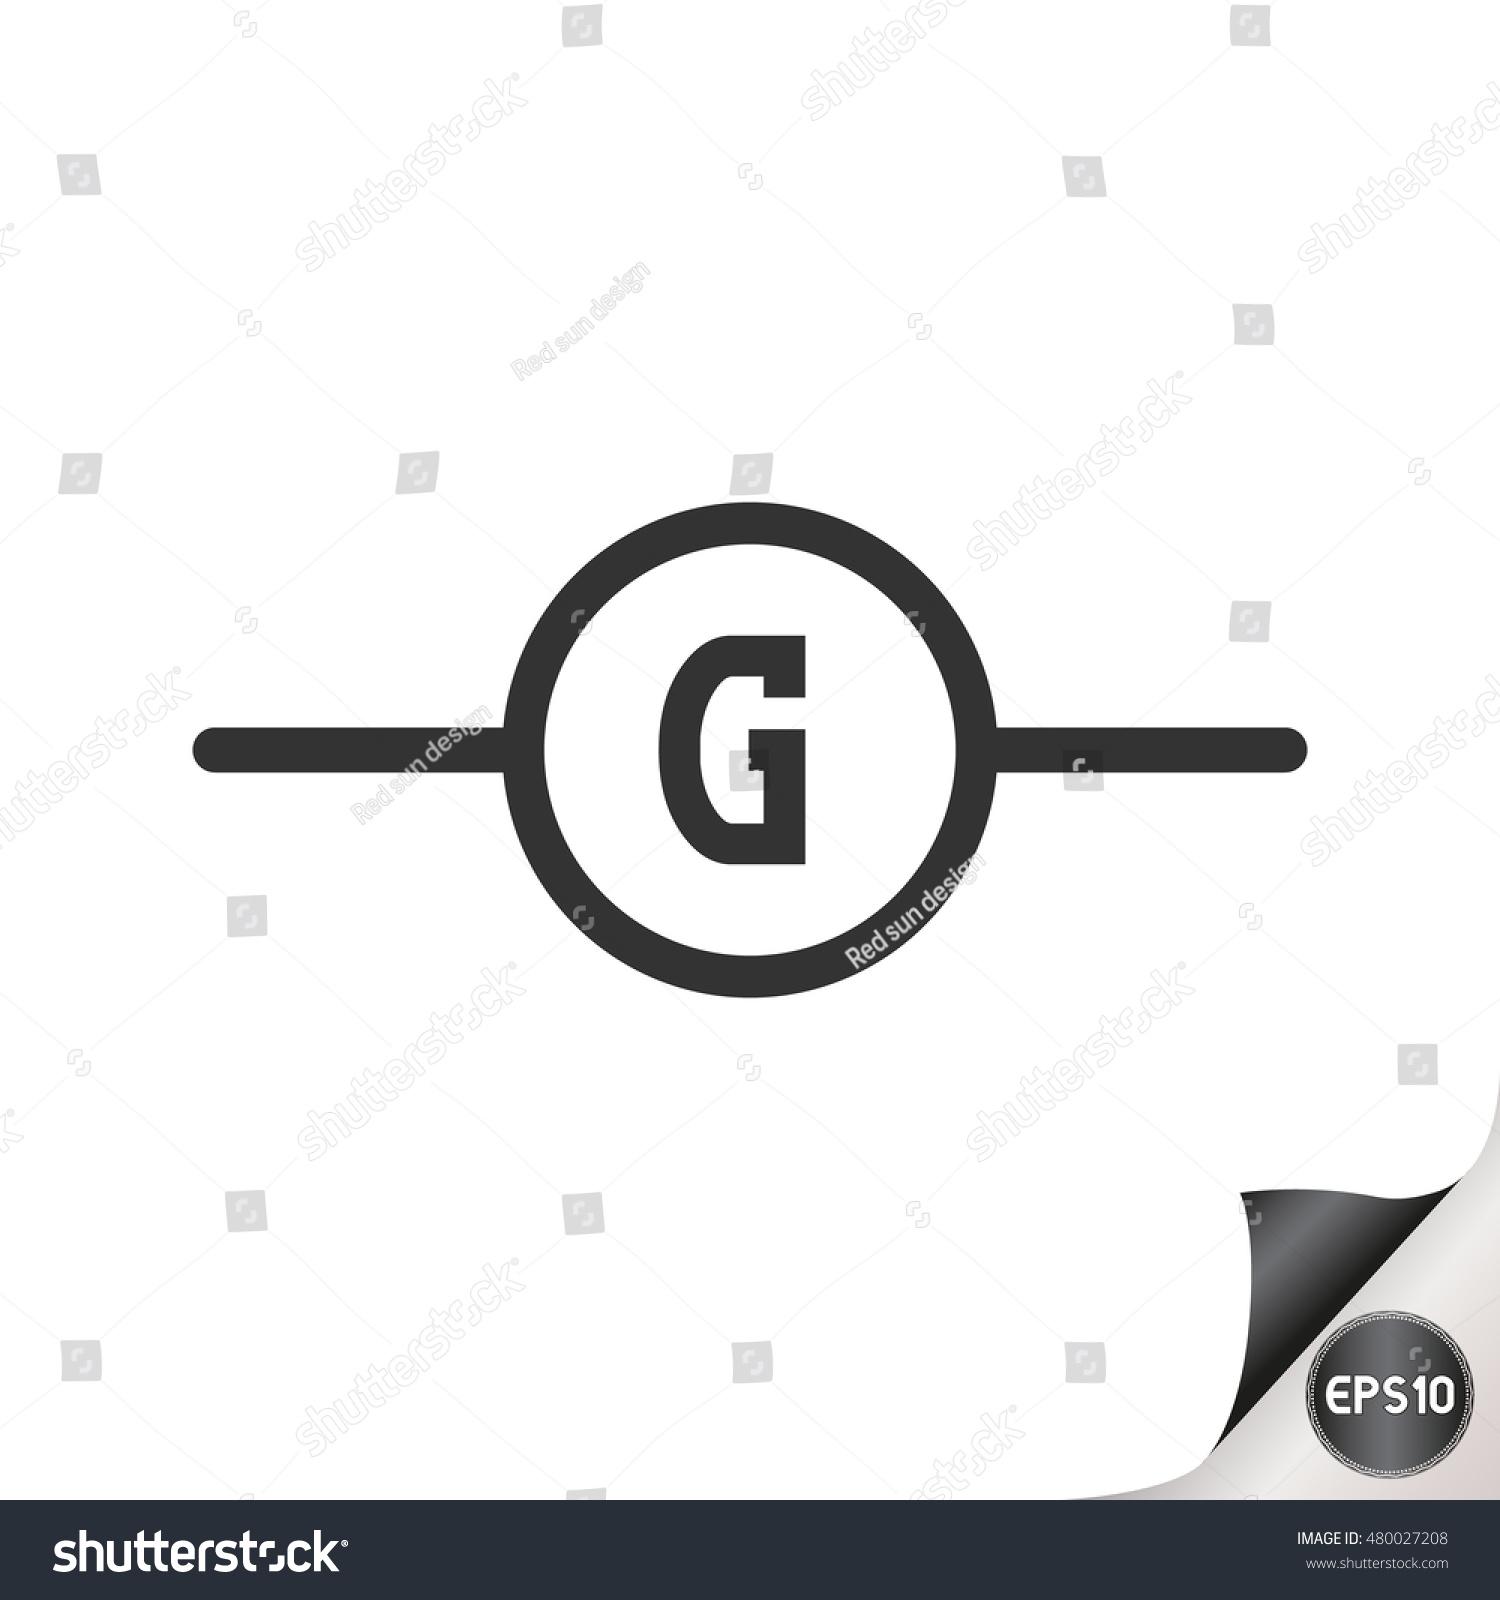 Electronic Circuit Symbols Generator Stock Vector Royalty Free